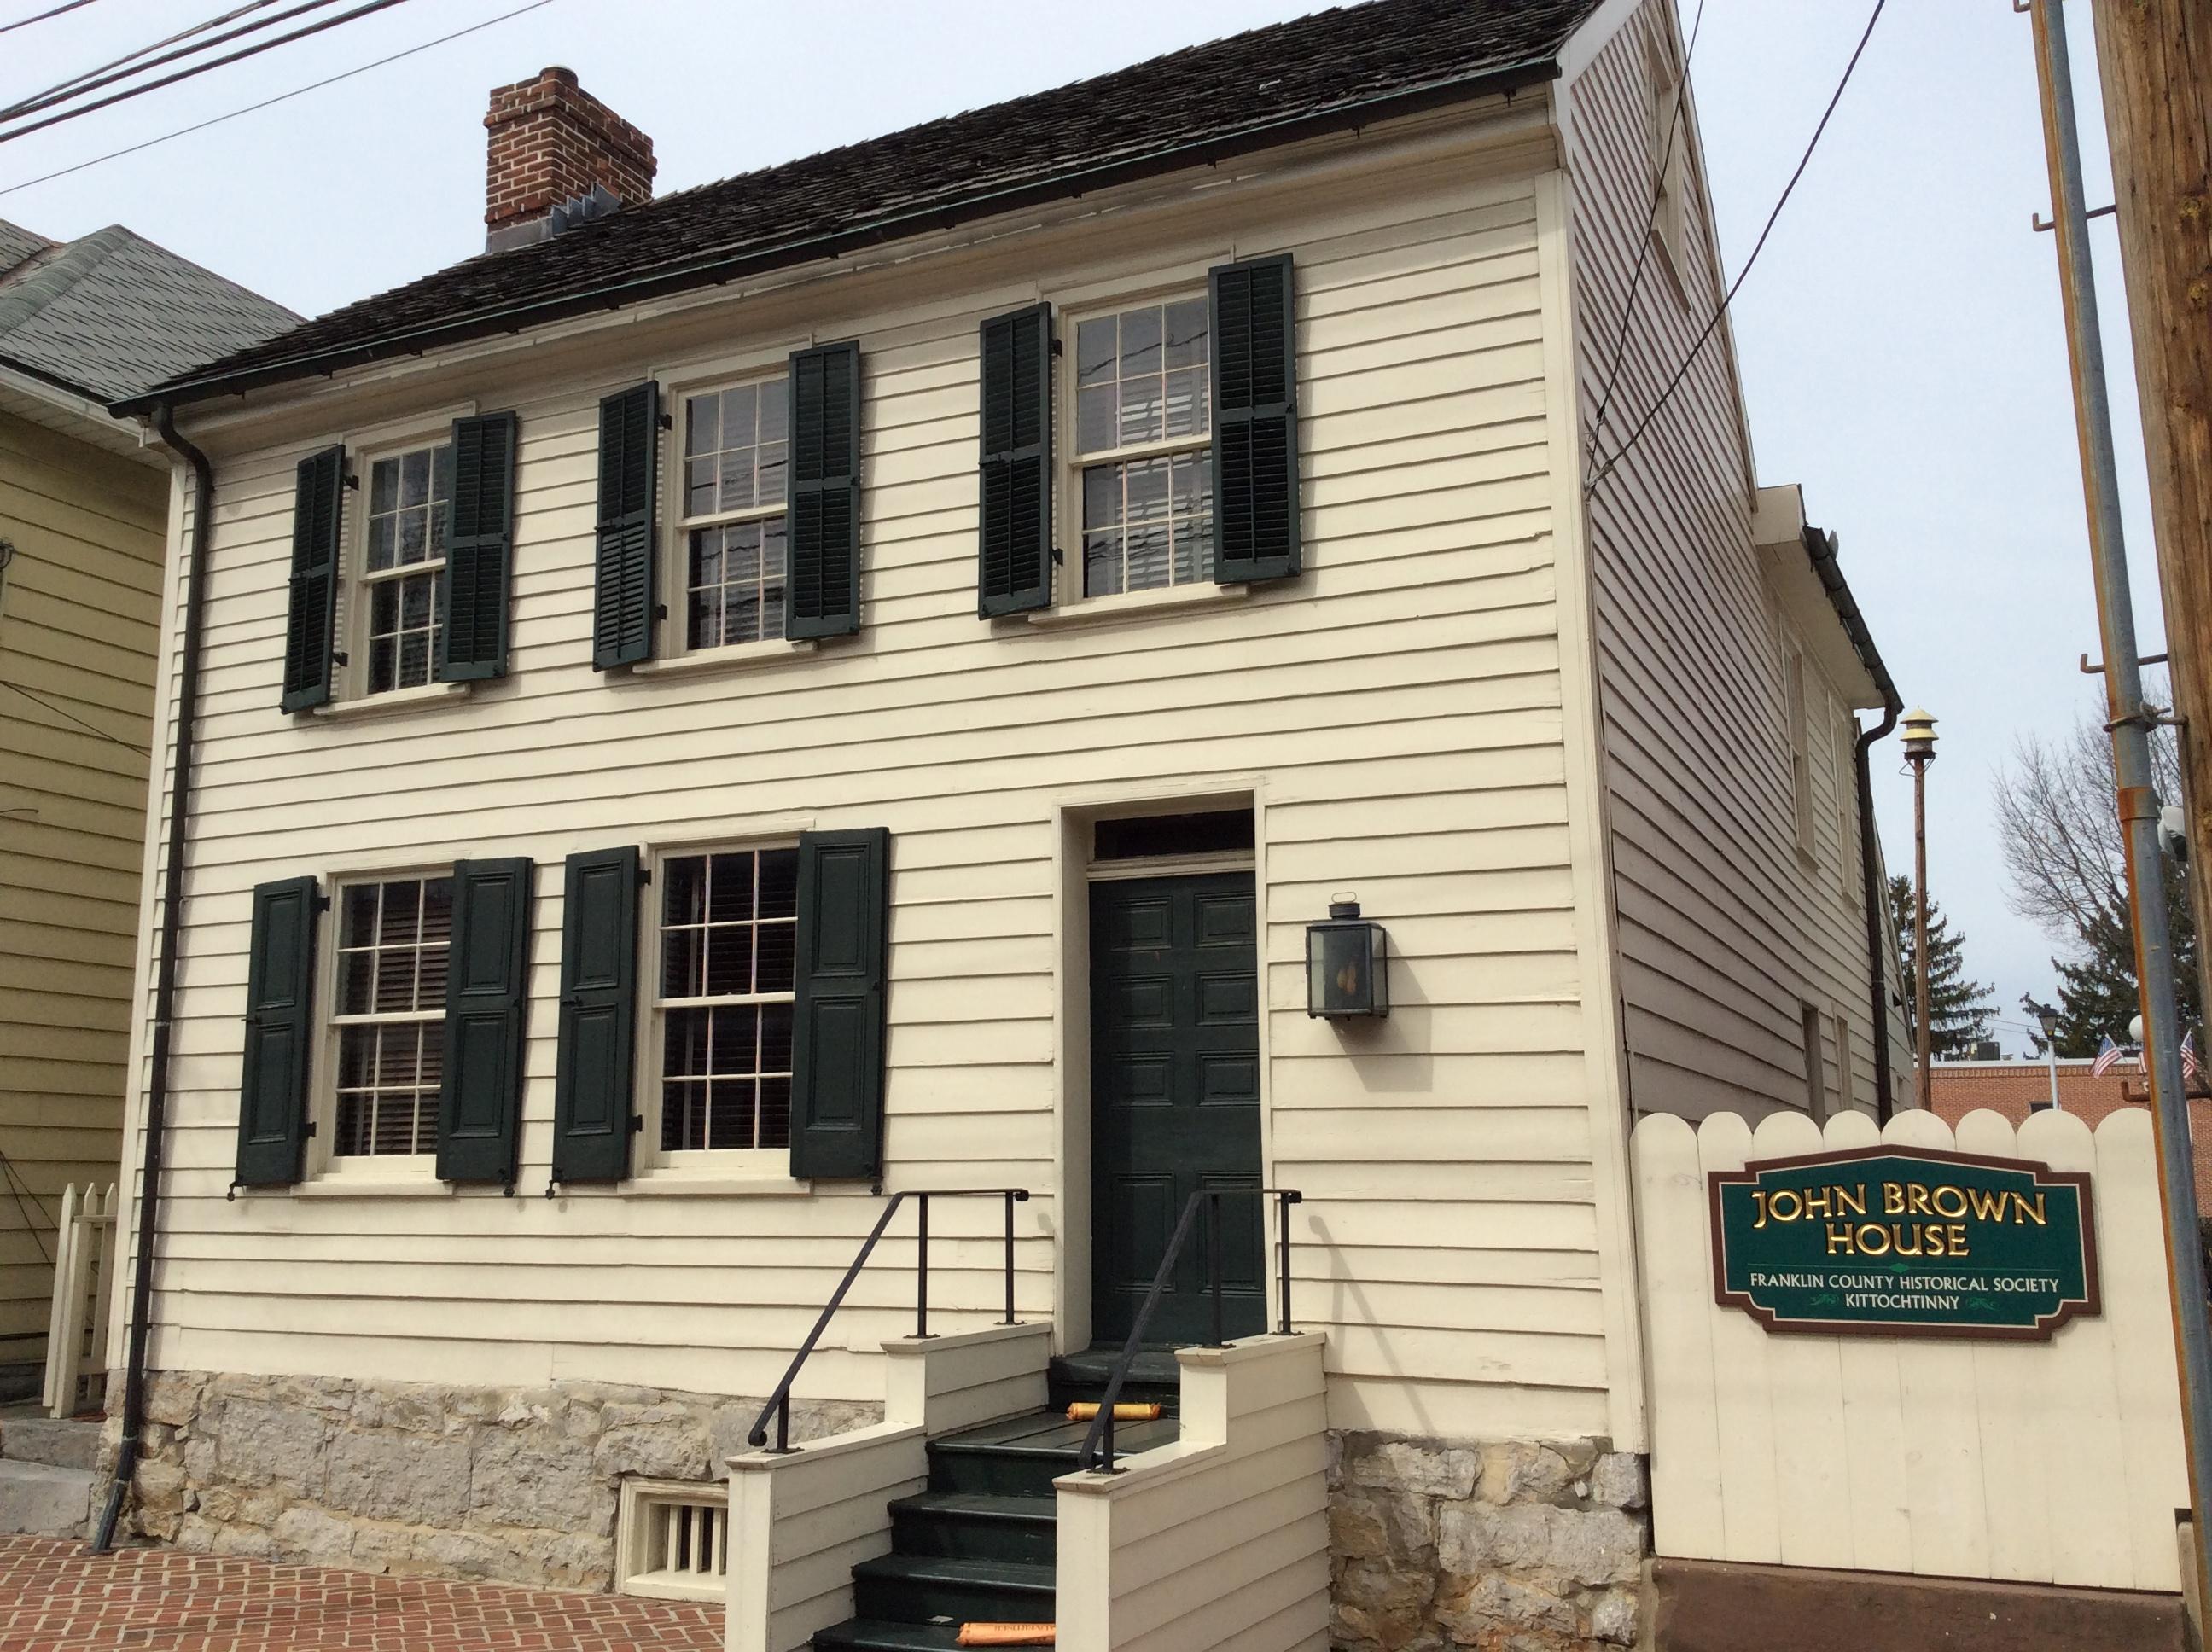 John Brown House (2) in Chambersburg, PA